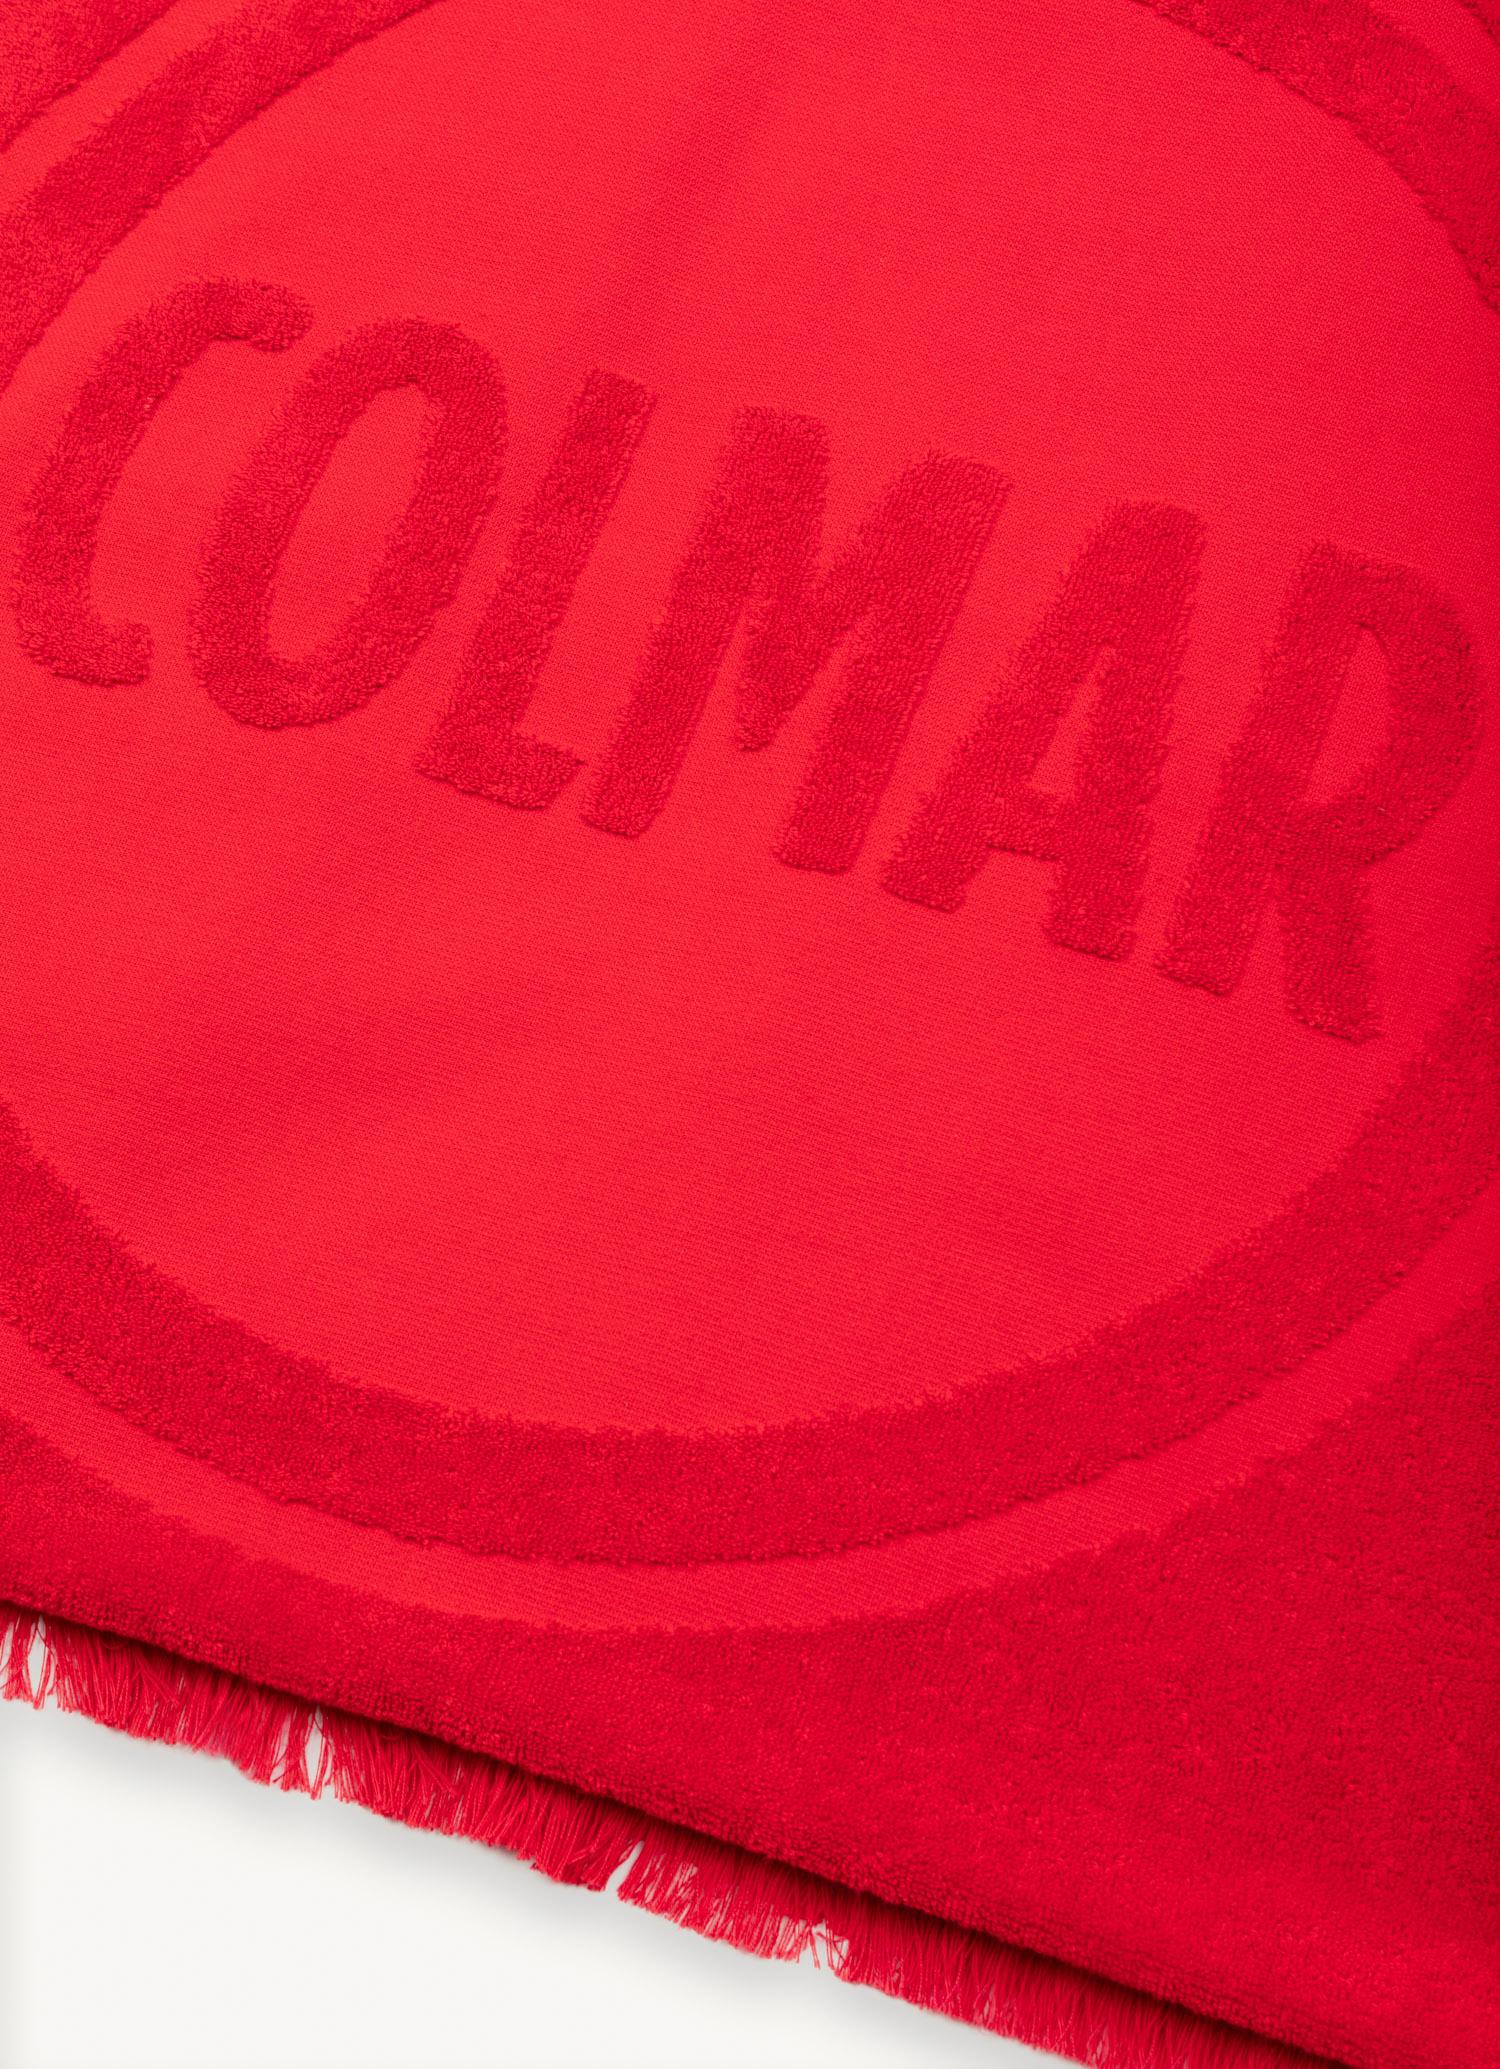 Telo mare Colmar Originals in spugna di cotone Colmar